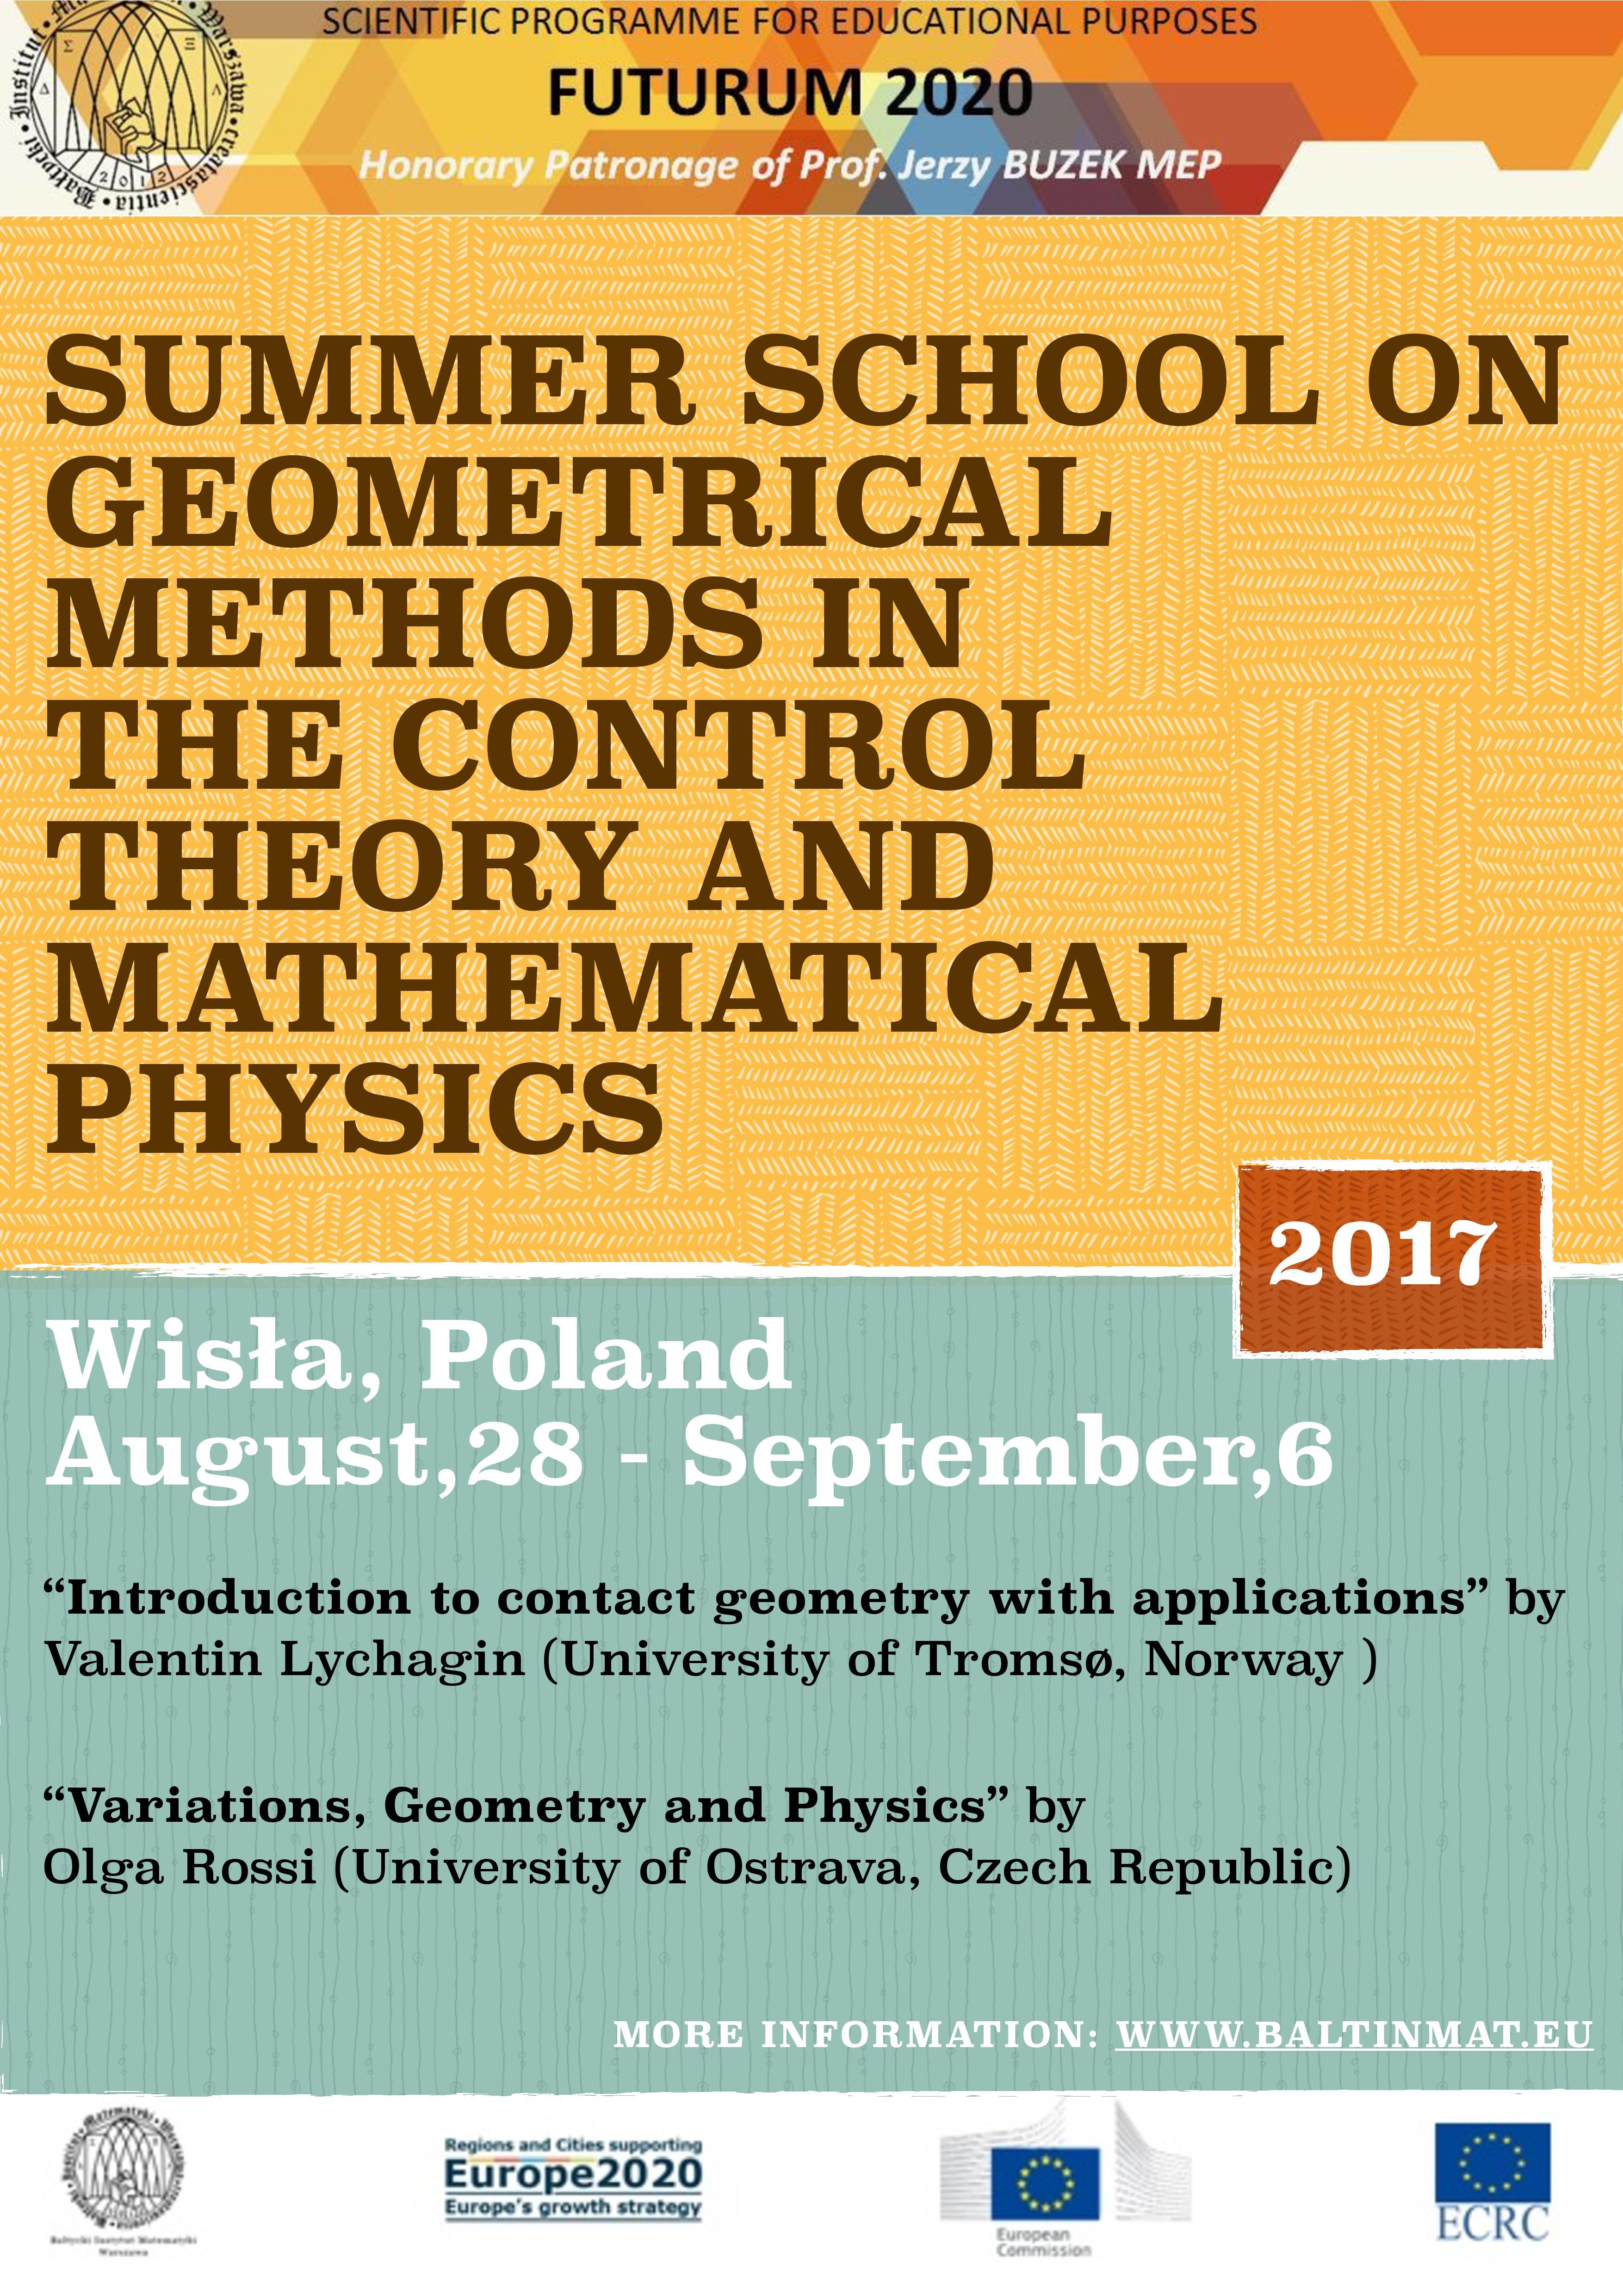 Bałtycki Instytut Matematyki | The site of Baltic Institute of ...